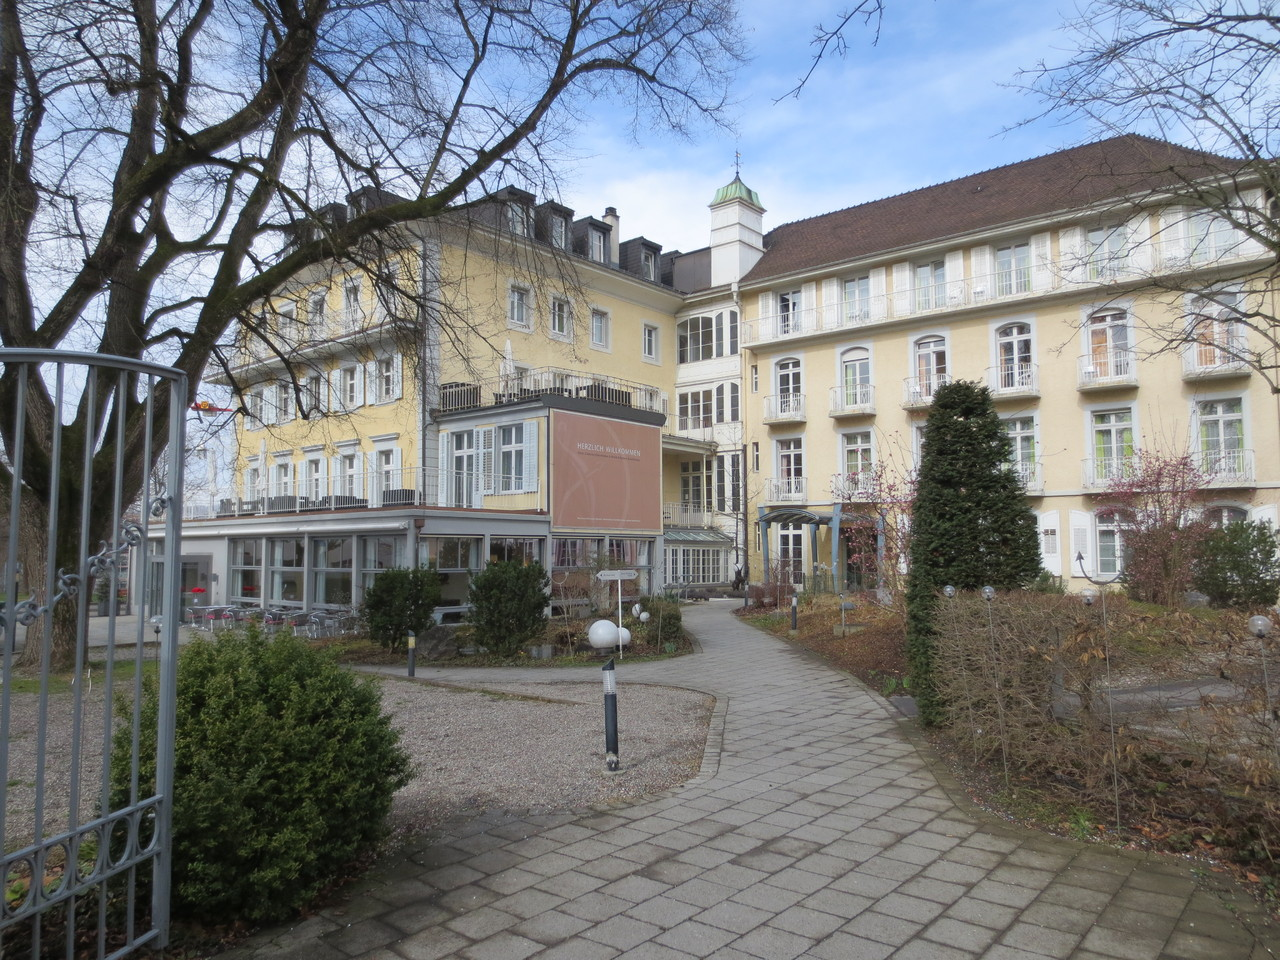 Hotel Restaurant Schützen, CH-4310 Rheinfelden